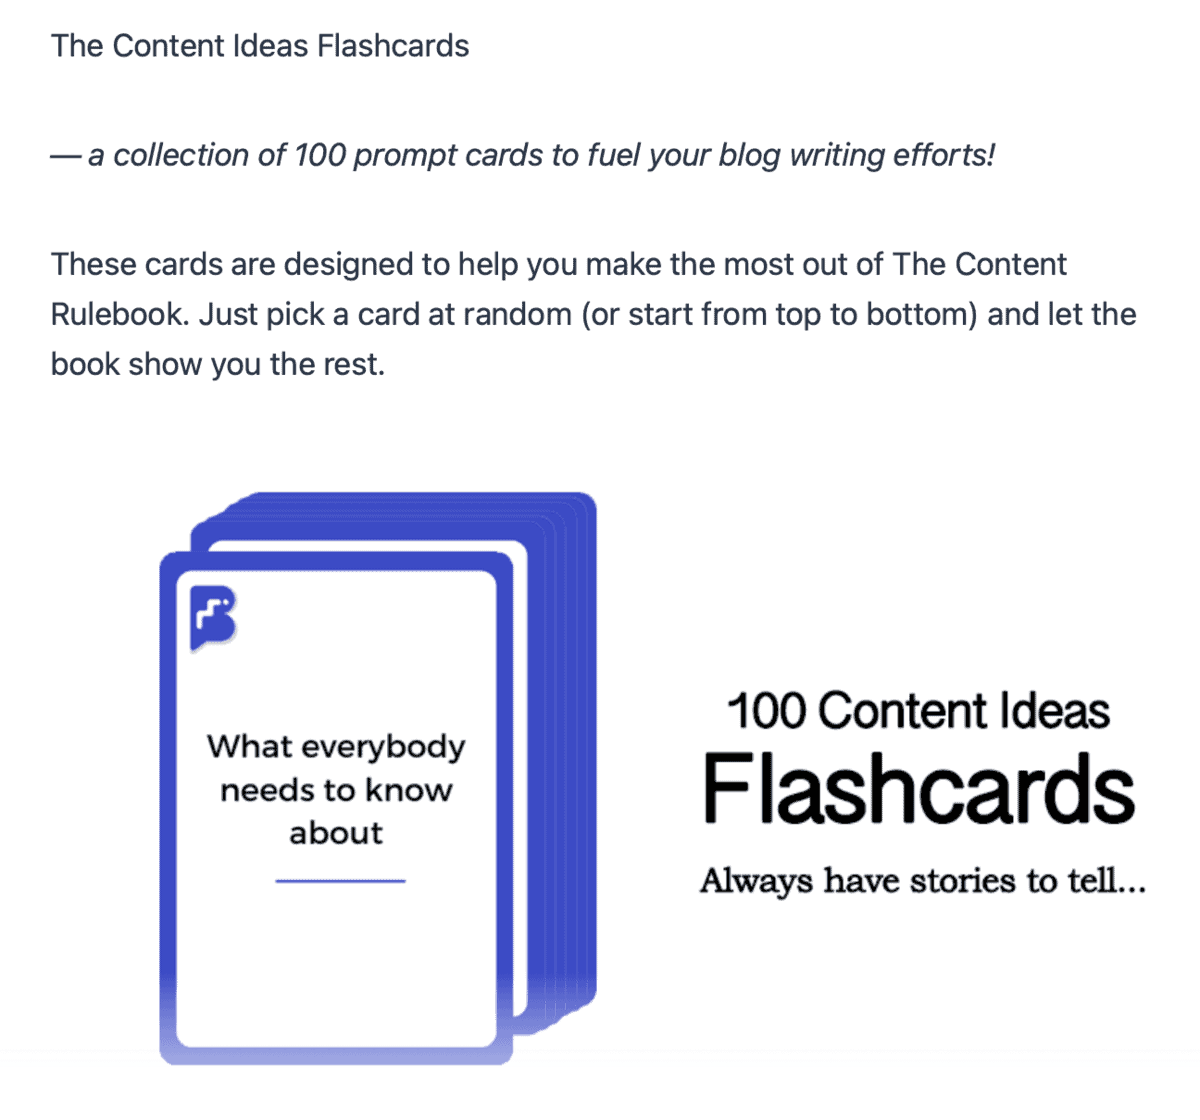 Content Ideas Flashcards